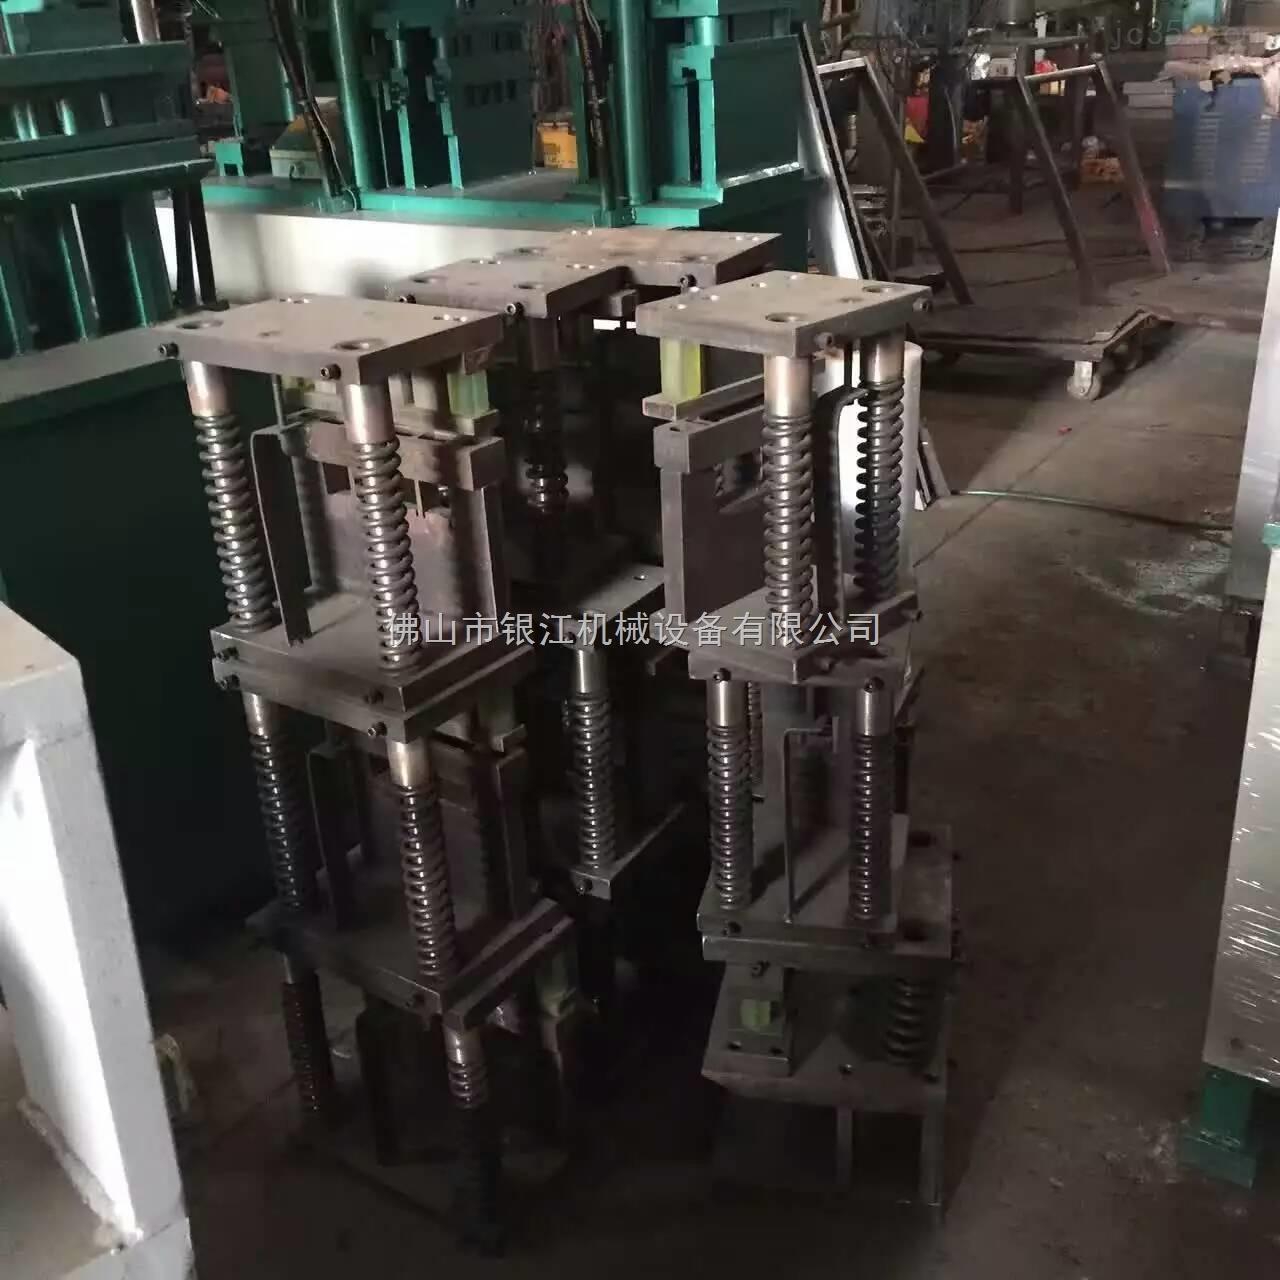 SUS304全球通用不锈钢防盗门冲锁孔机厂家降价了